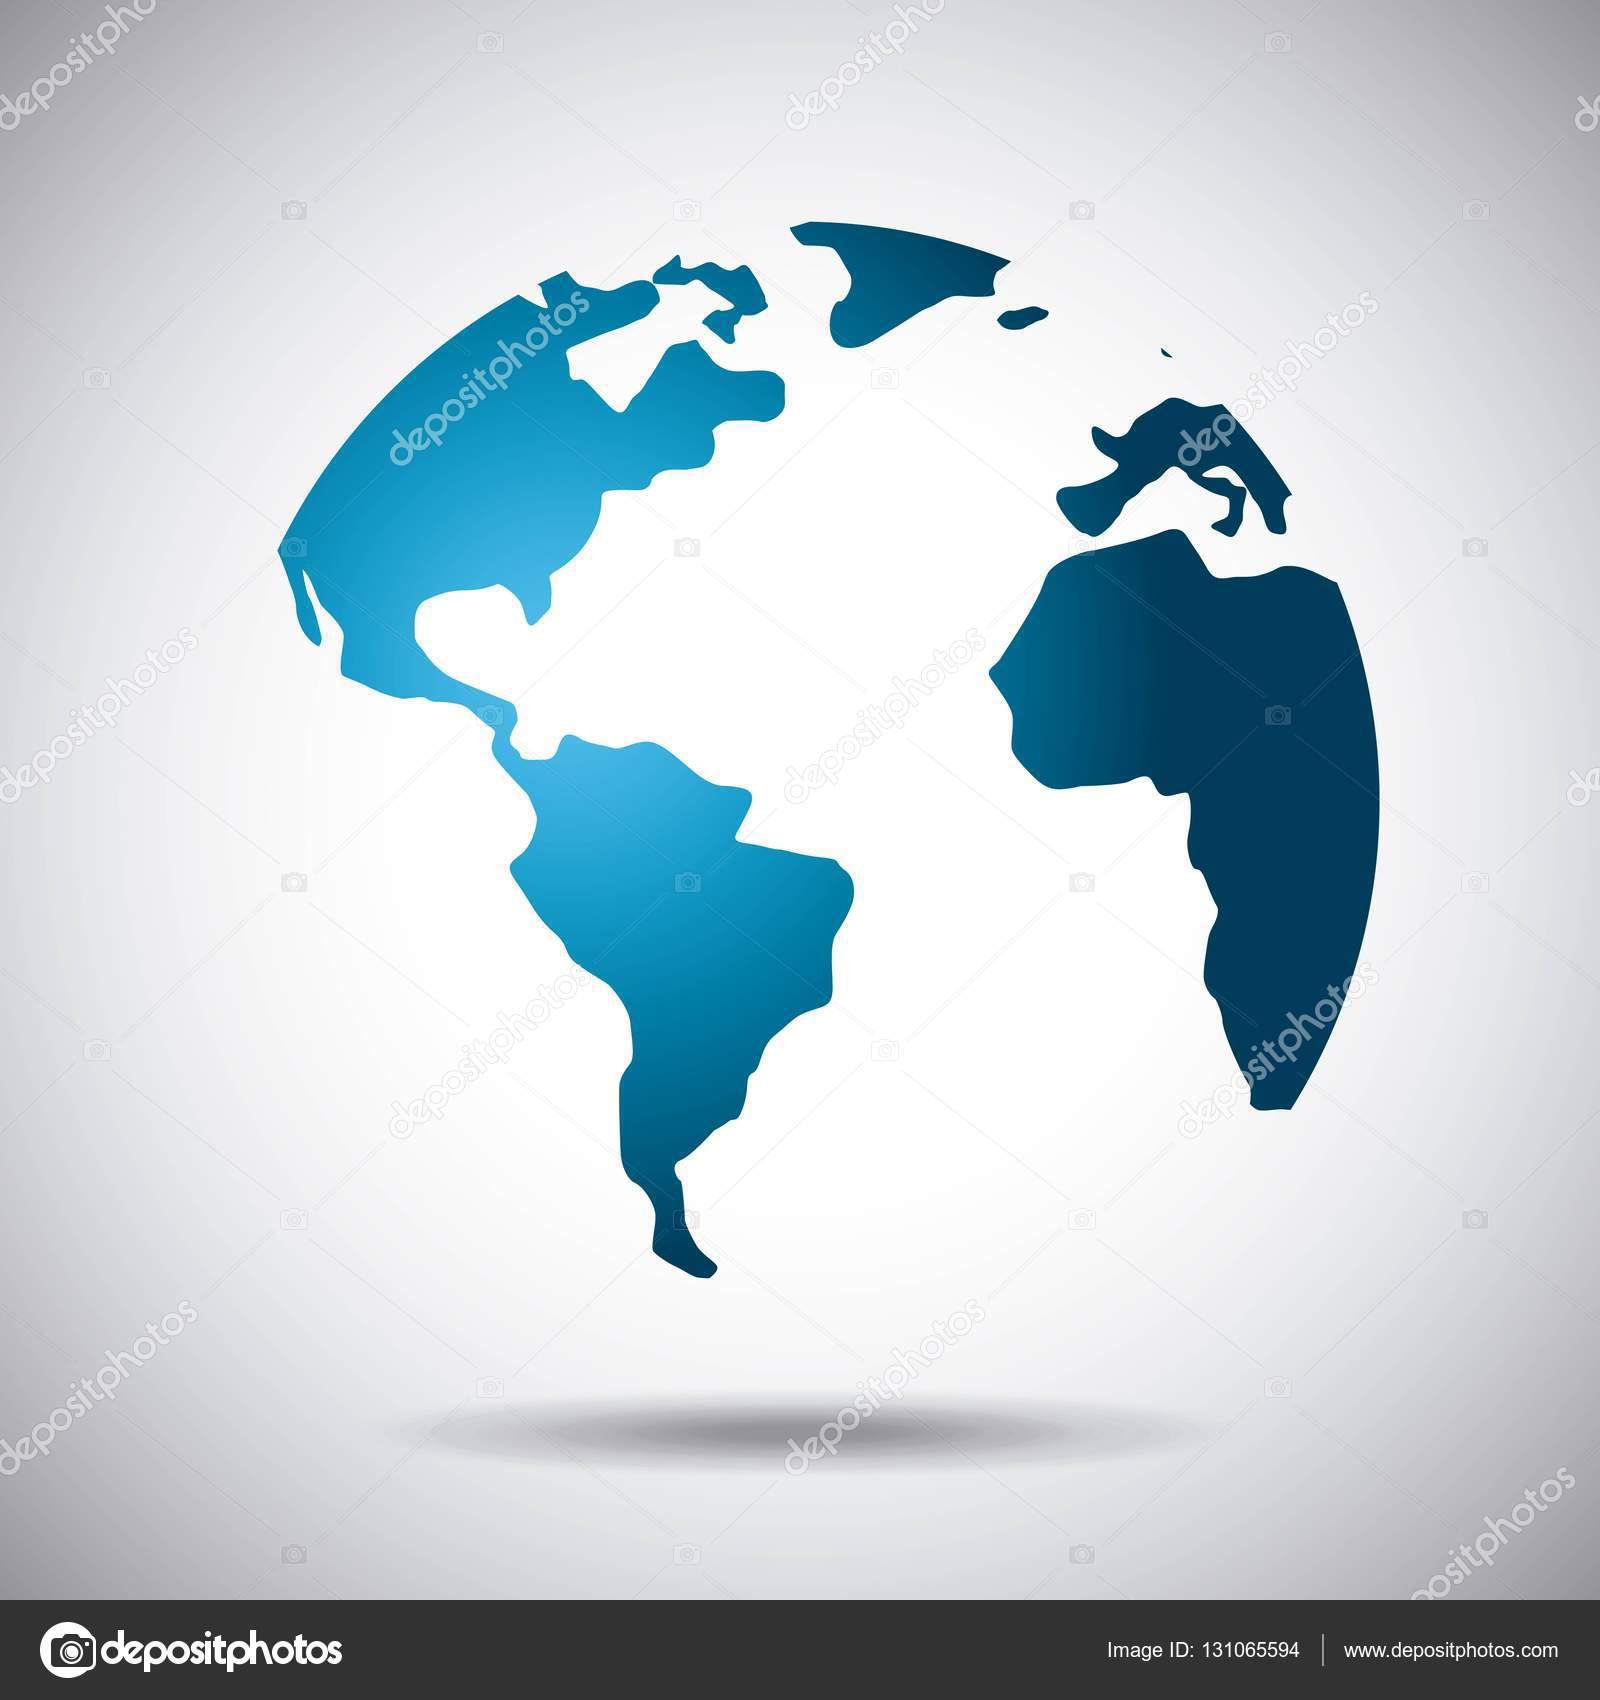 World map icon stock vector yupiramos 131065594 blue world map over white background vector illustration vector by yupiramos gumiabroncs Gallery